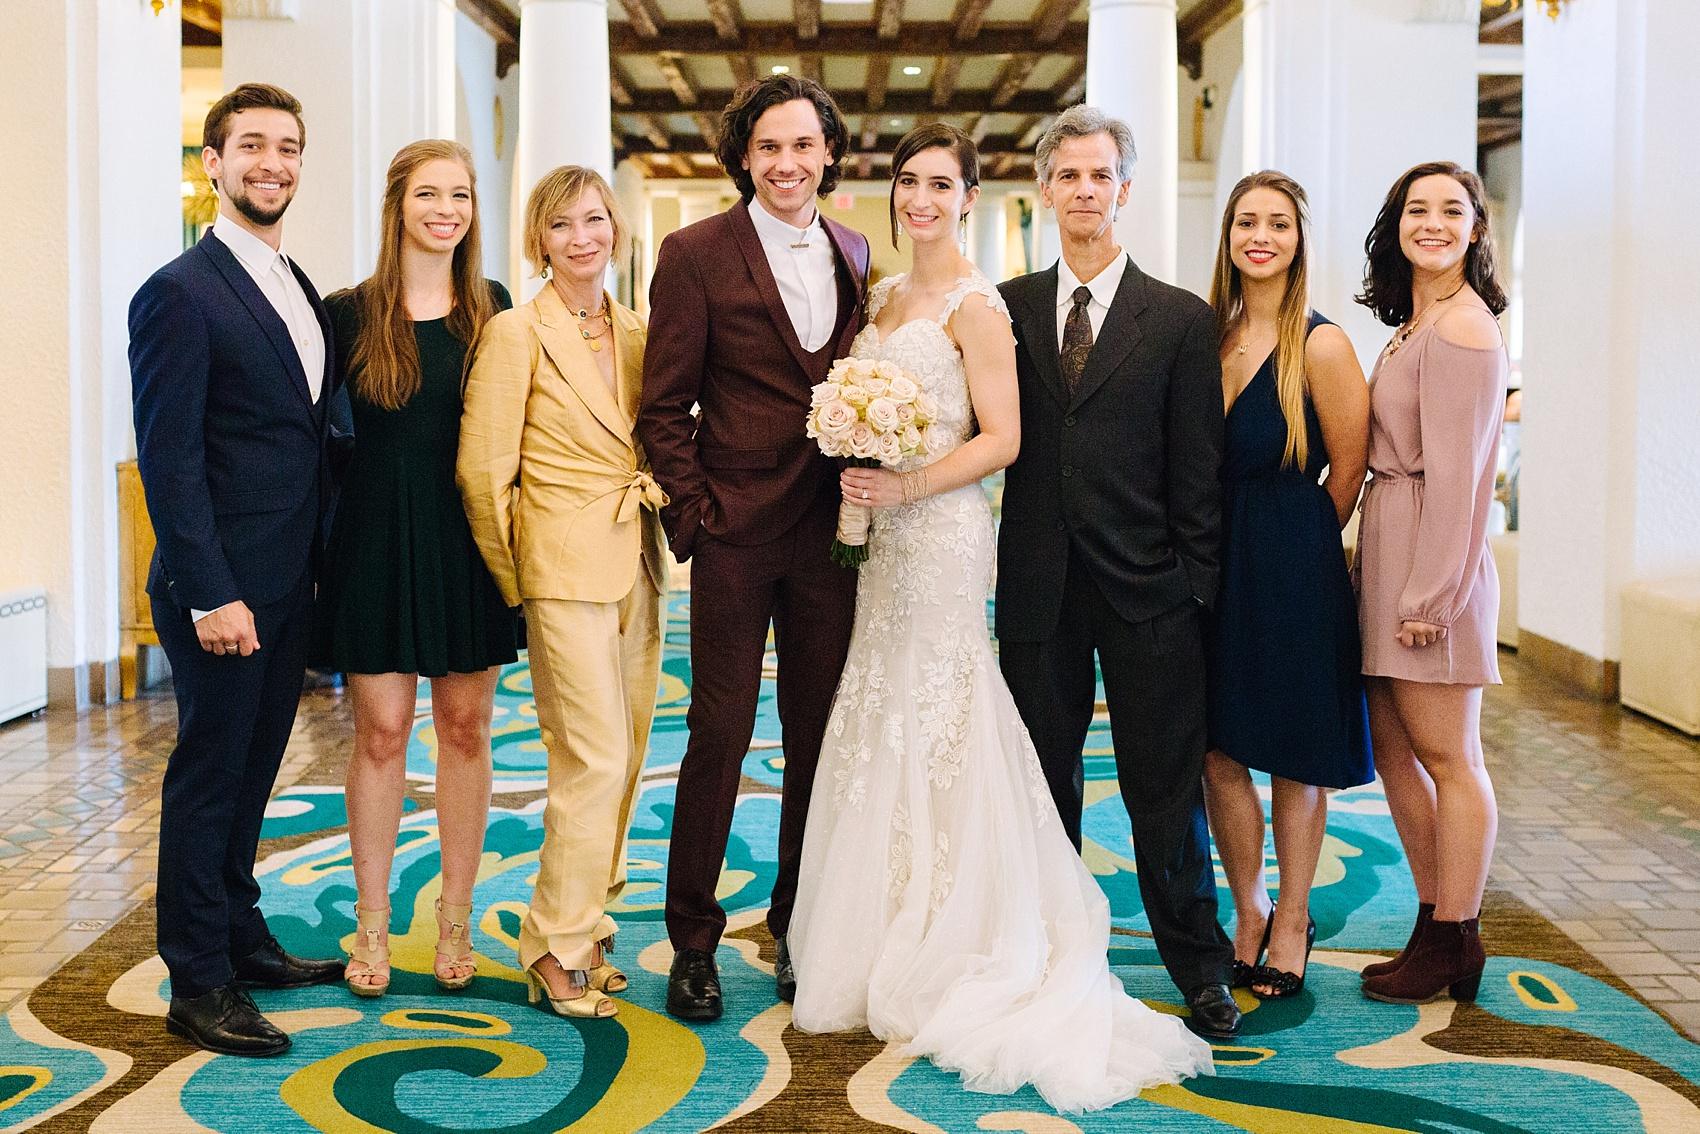 nick miranda wedding duncan mclellan gallery wedding-20-01.jpg